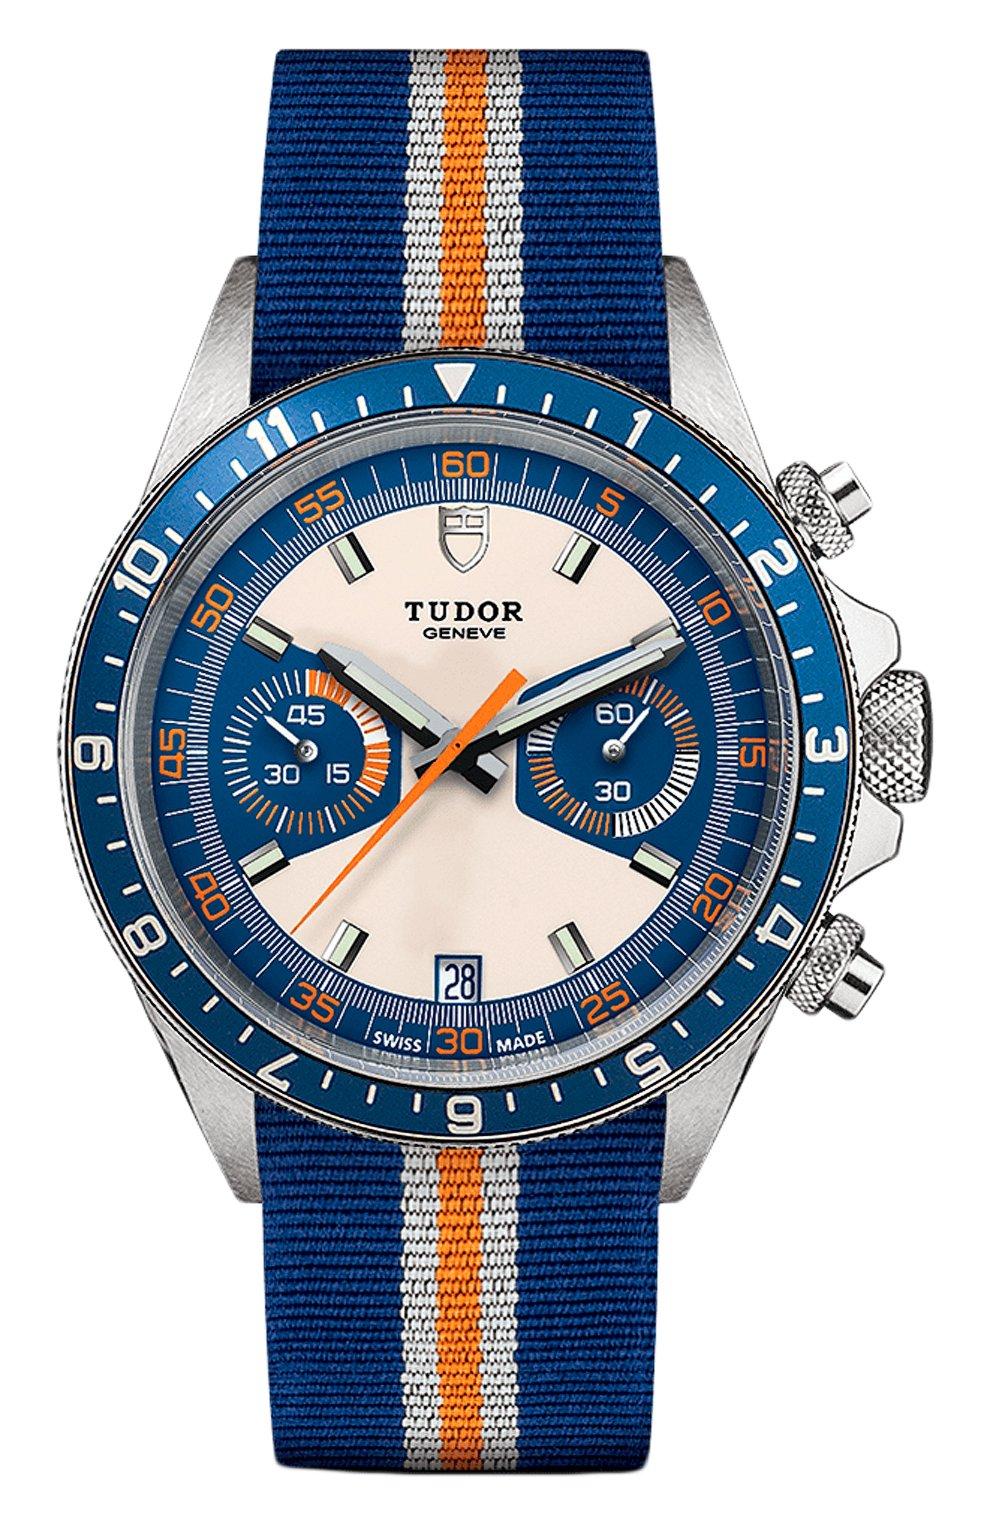 Мужские часы chrono blue TUDOR бесцветного цвета, арт. 70330B/BLUE FABRIC WHITE AND ORANGE/OPALINE BLUE   Фото 1 (Механизм: Автомат; Материал корпуса: Сталь; Цвет циферблата: Другое)